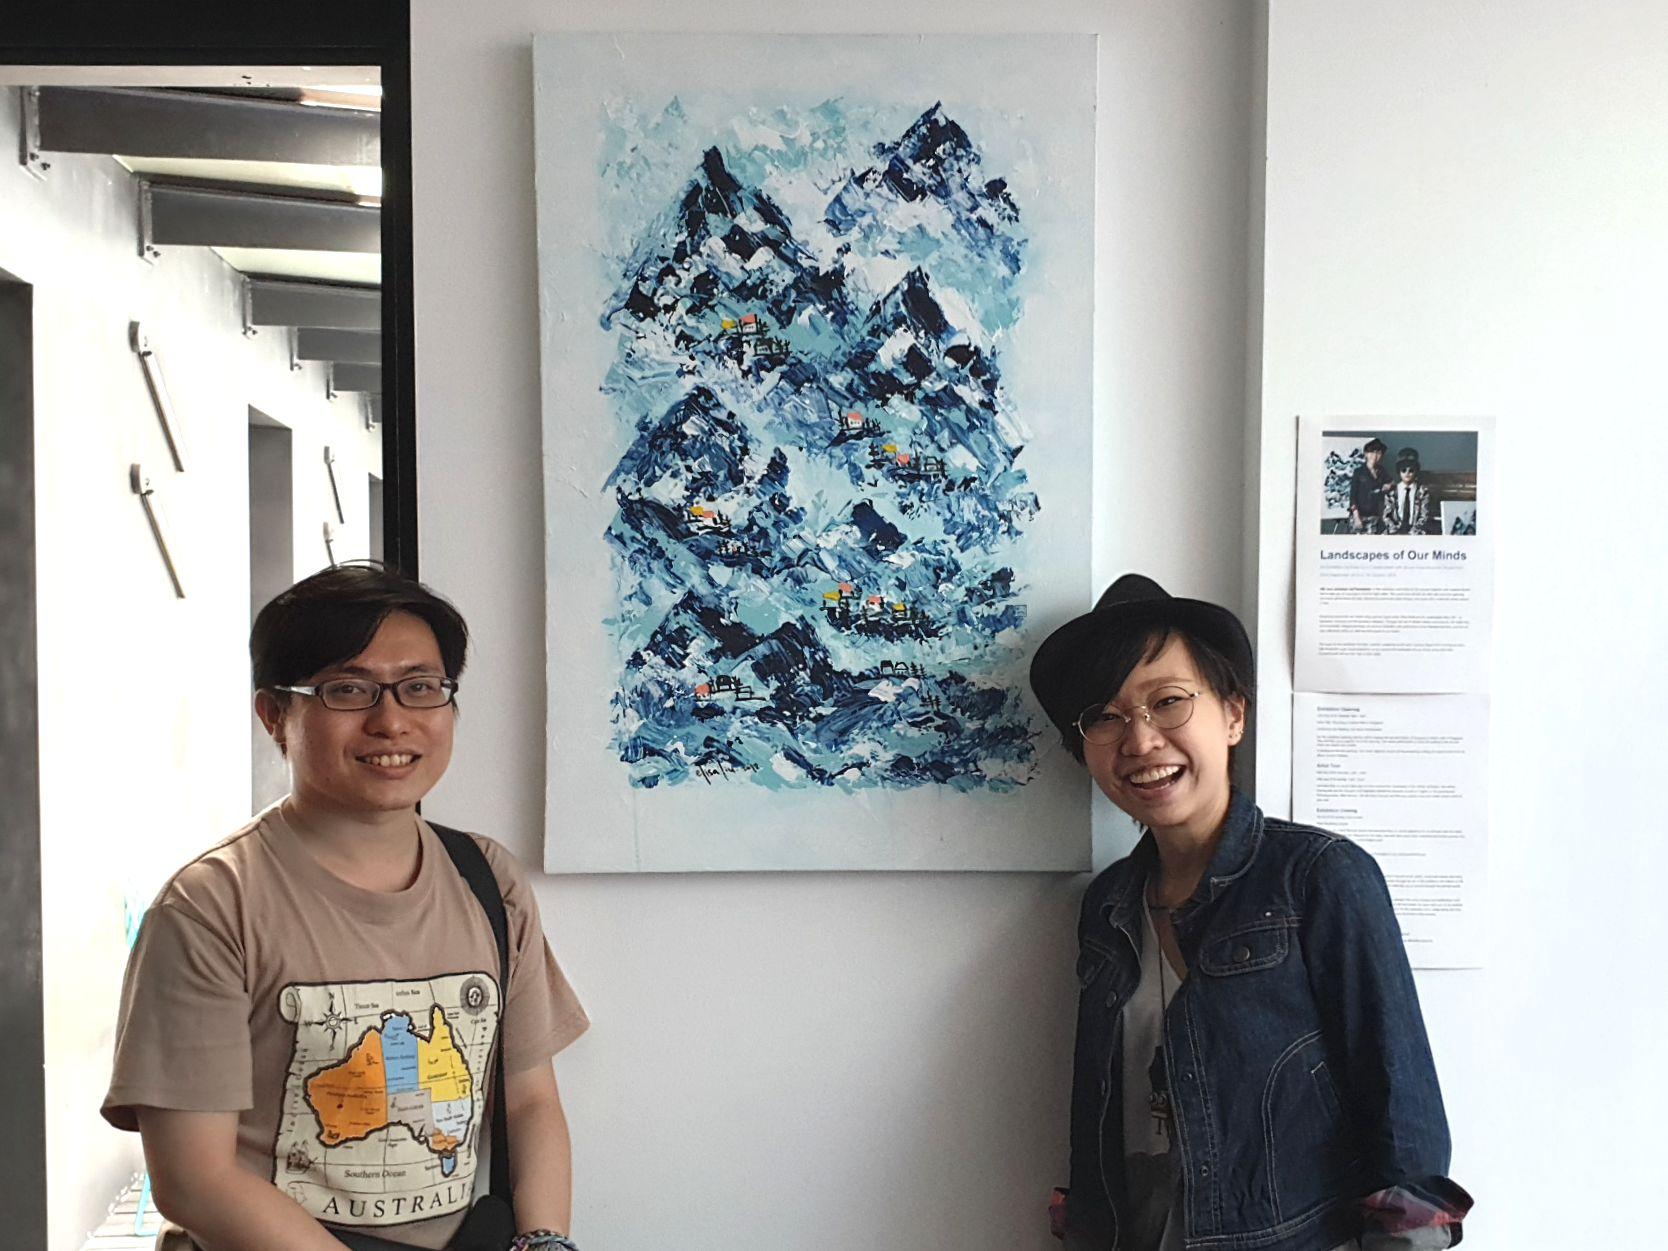 Elisa-Liu-Art-Landscapes-of-our-Minds-Exhibition-Artist Tour-07.jpg